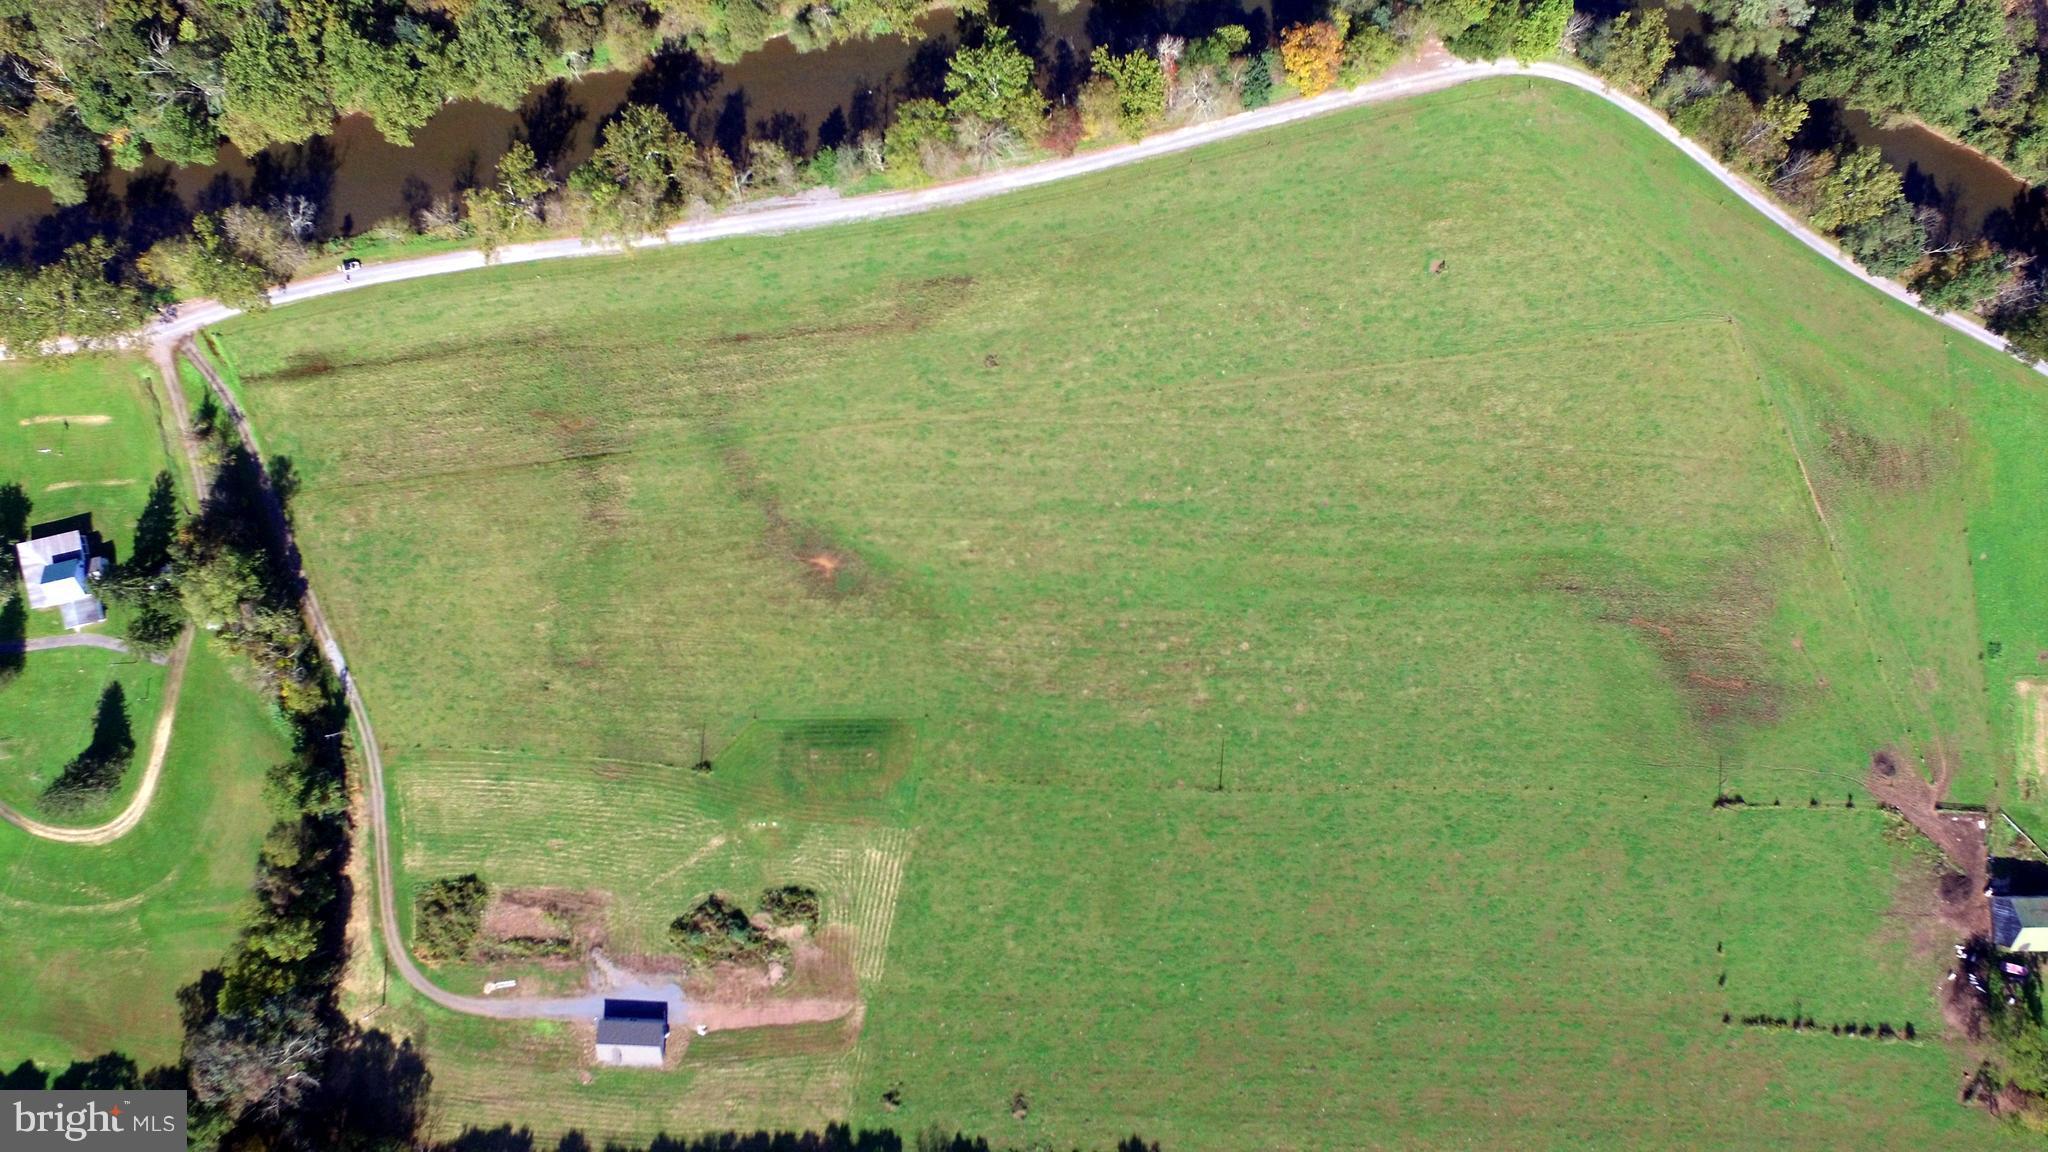 KIWANIS FARM RD, MILLERSBURG, PA 17061